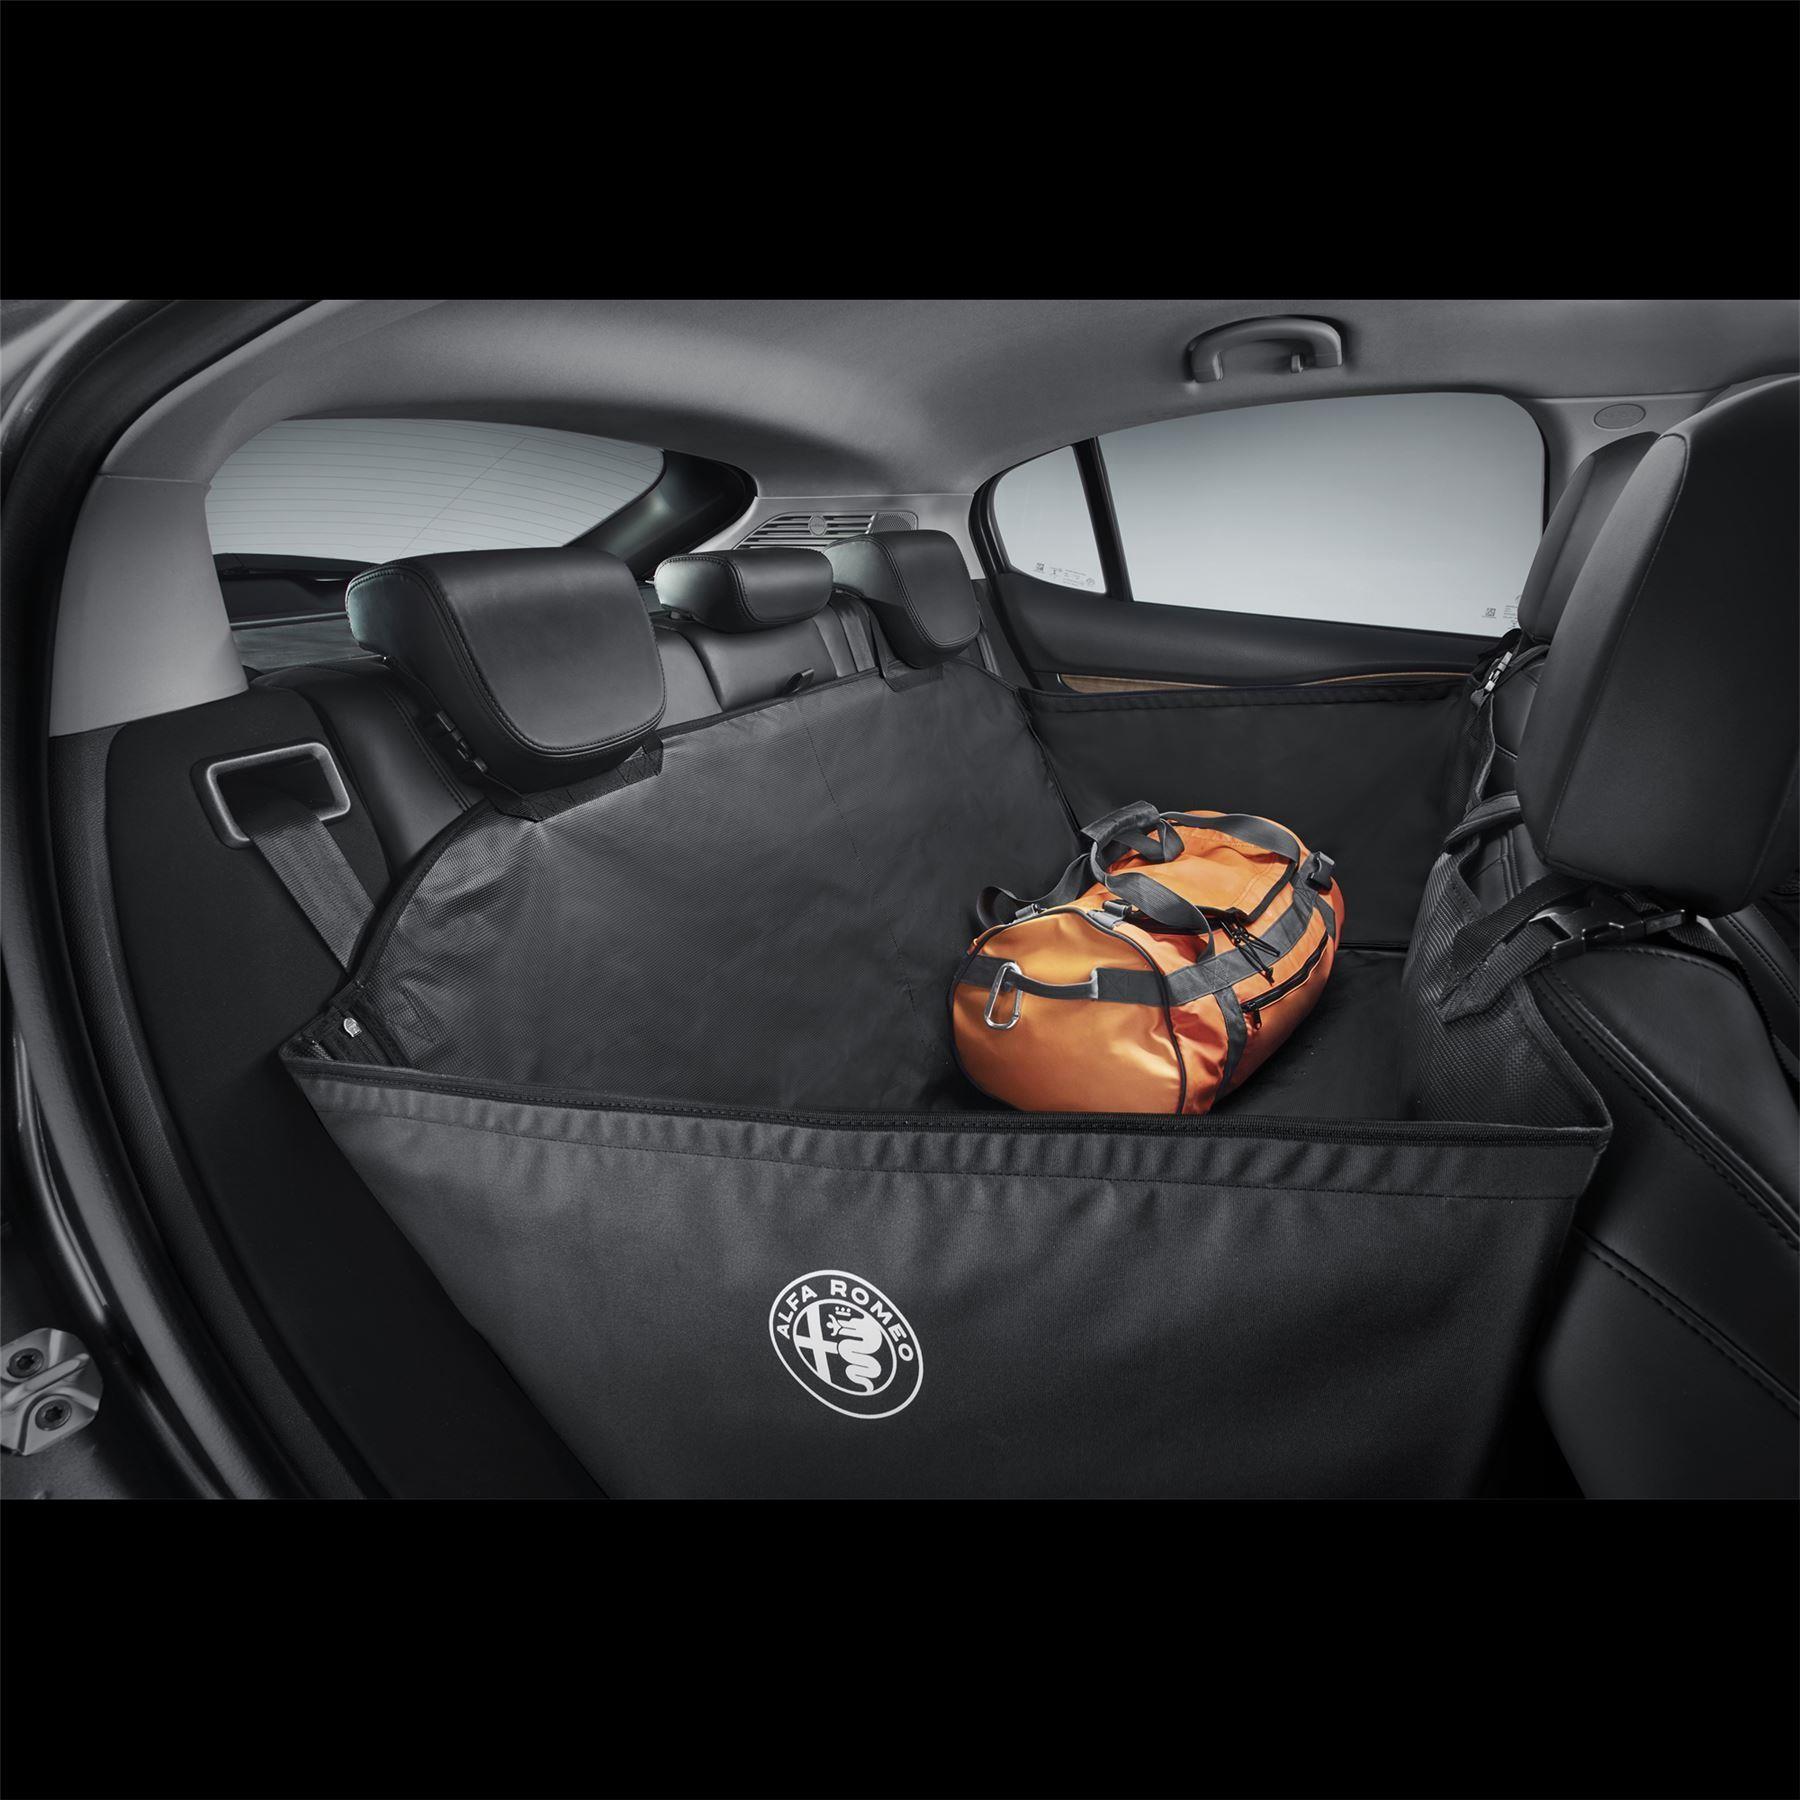 Stelvio/Giulia Rear Seat Protection/Damage/Tear/Scratch Cover